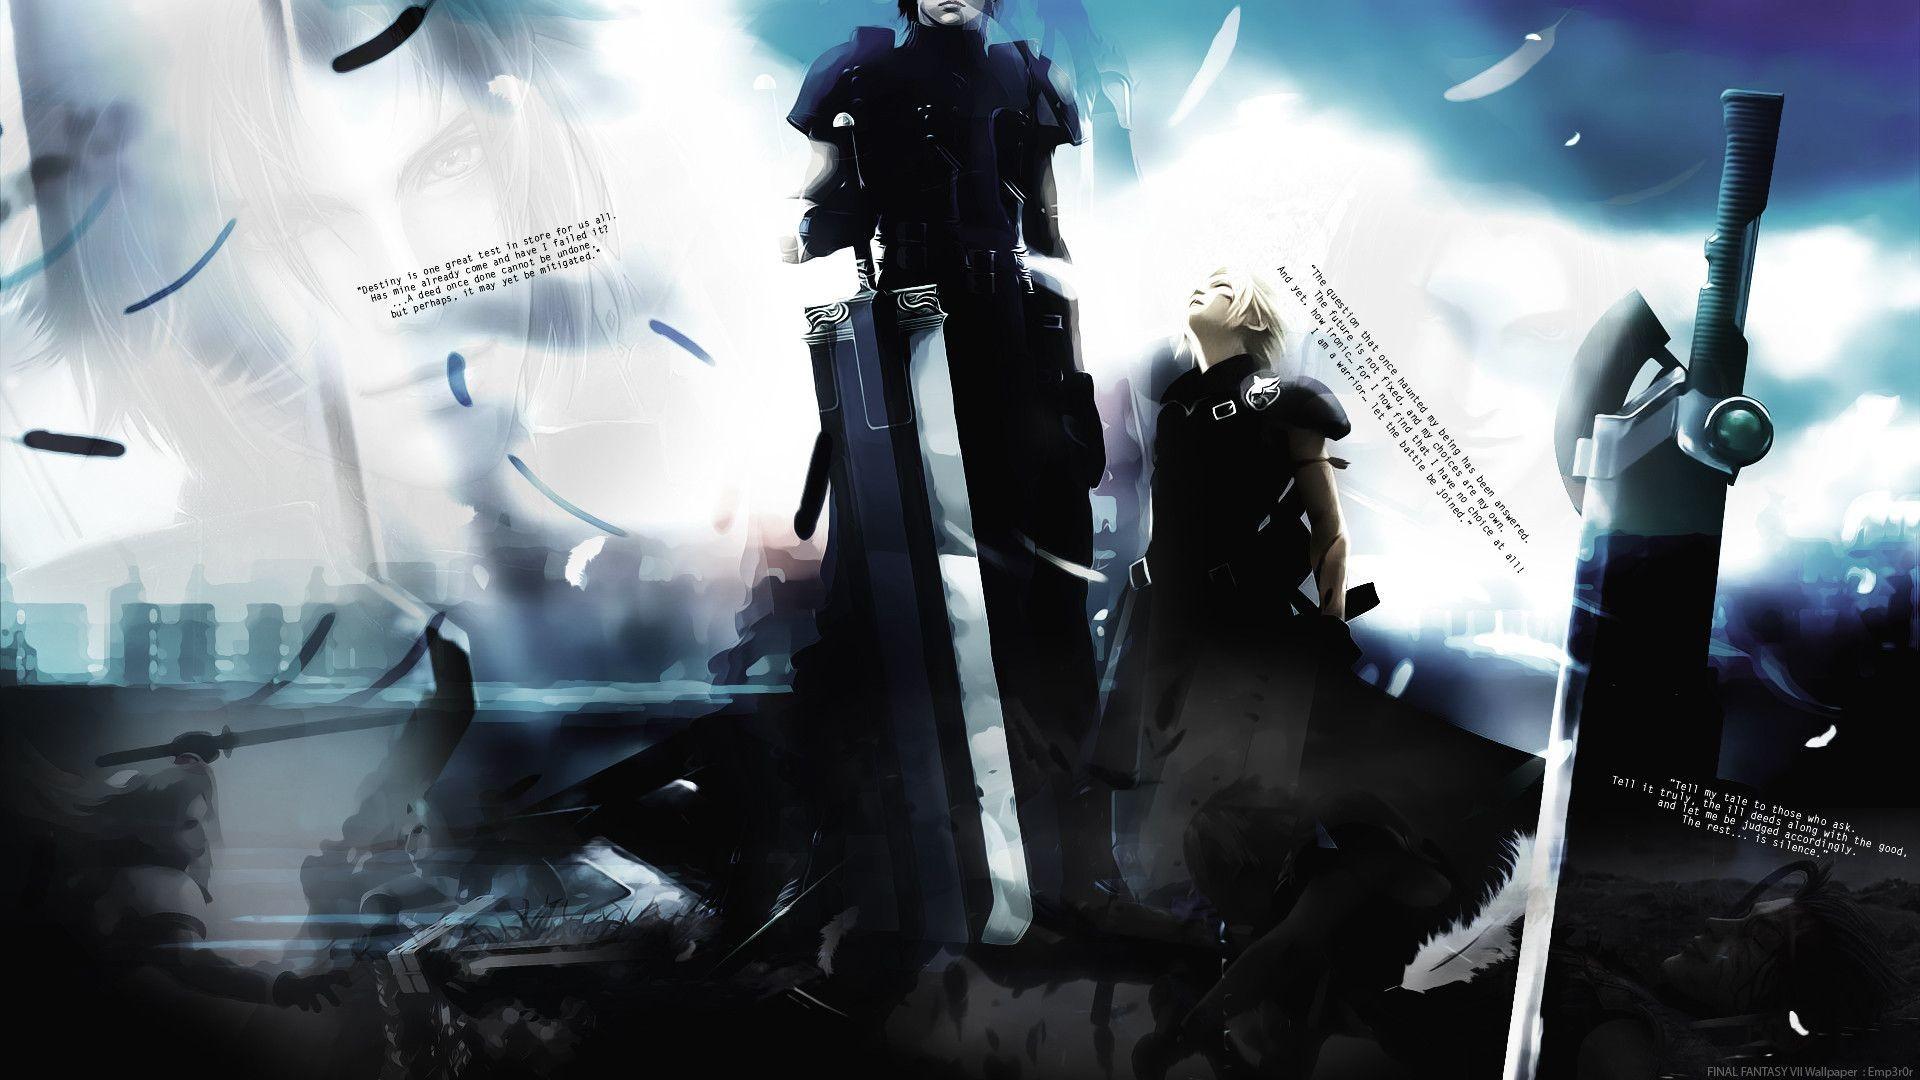 Final Fantasy HD Wallpapers Wallpaper